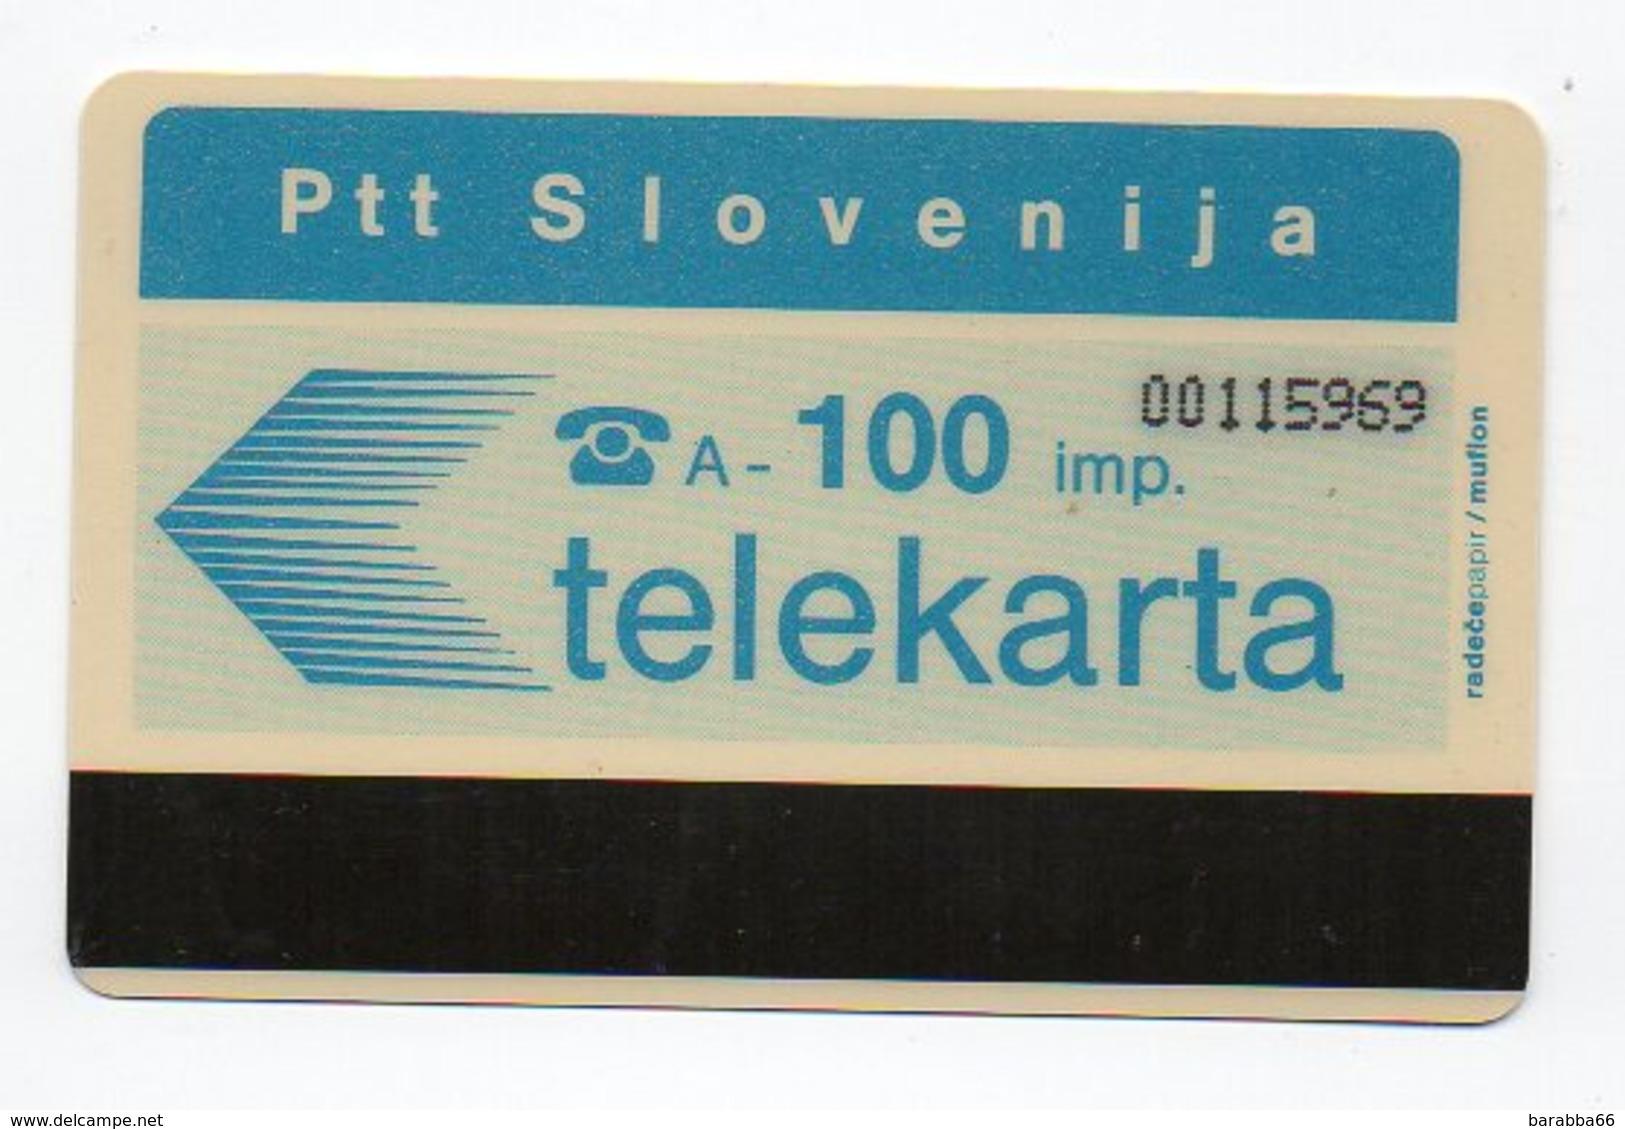 Ptt Slovenija - Telekarta -  100 Imp. - Slovenia